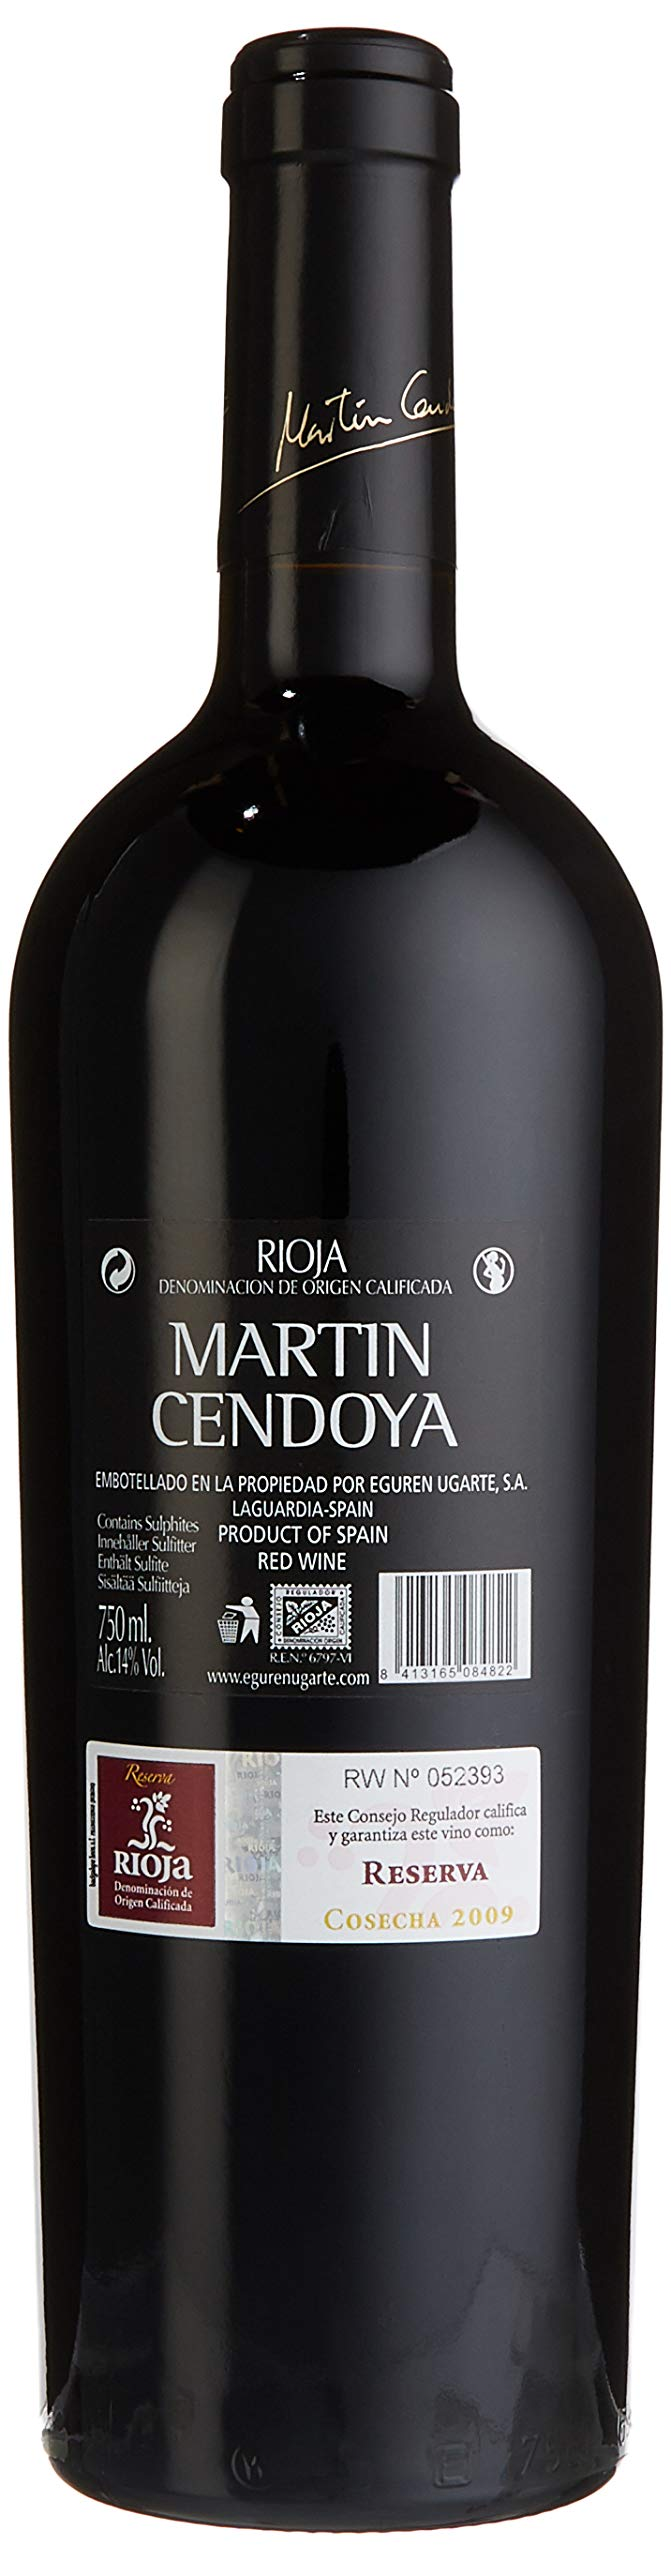 Heredad-Ugarte-Martin-Cendoya-Reserva-20072009-trocken-1-x-075-l